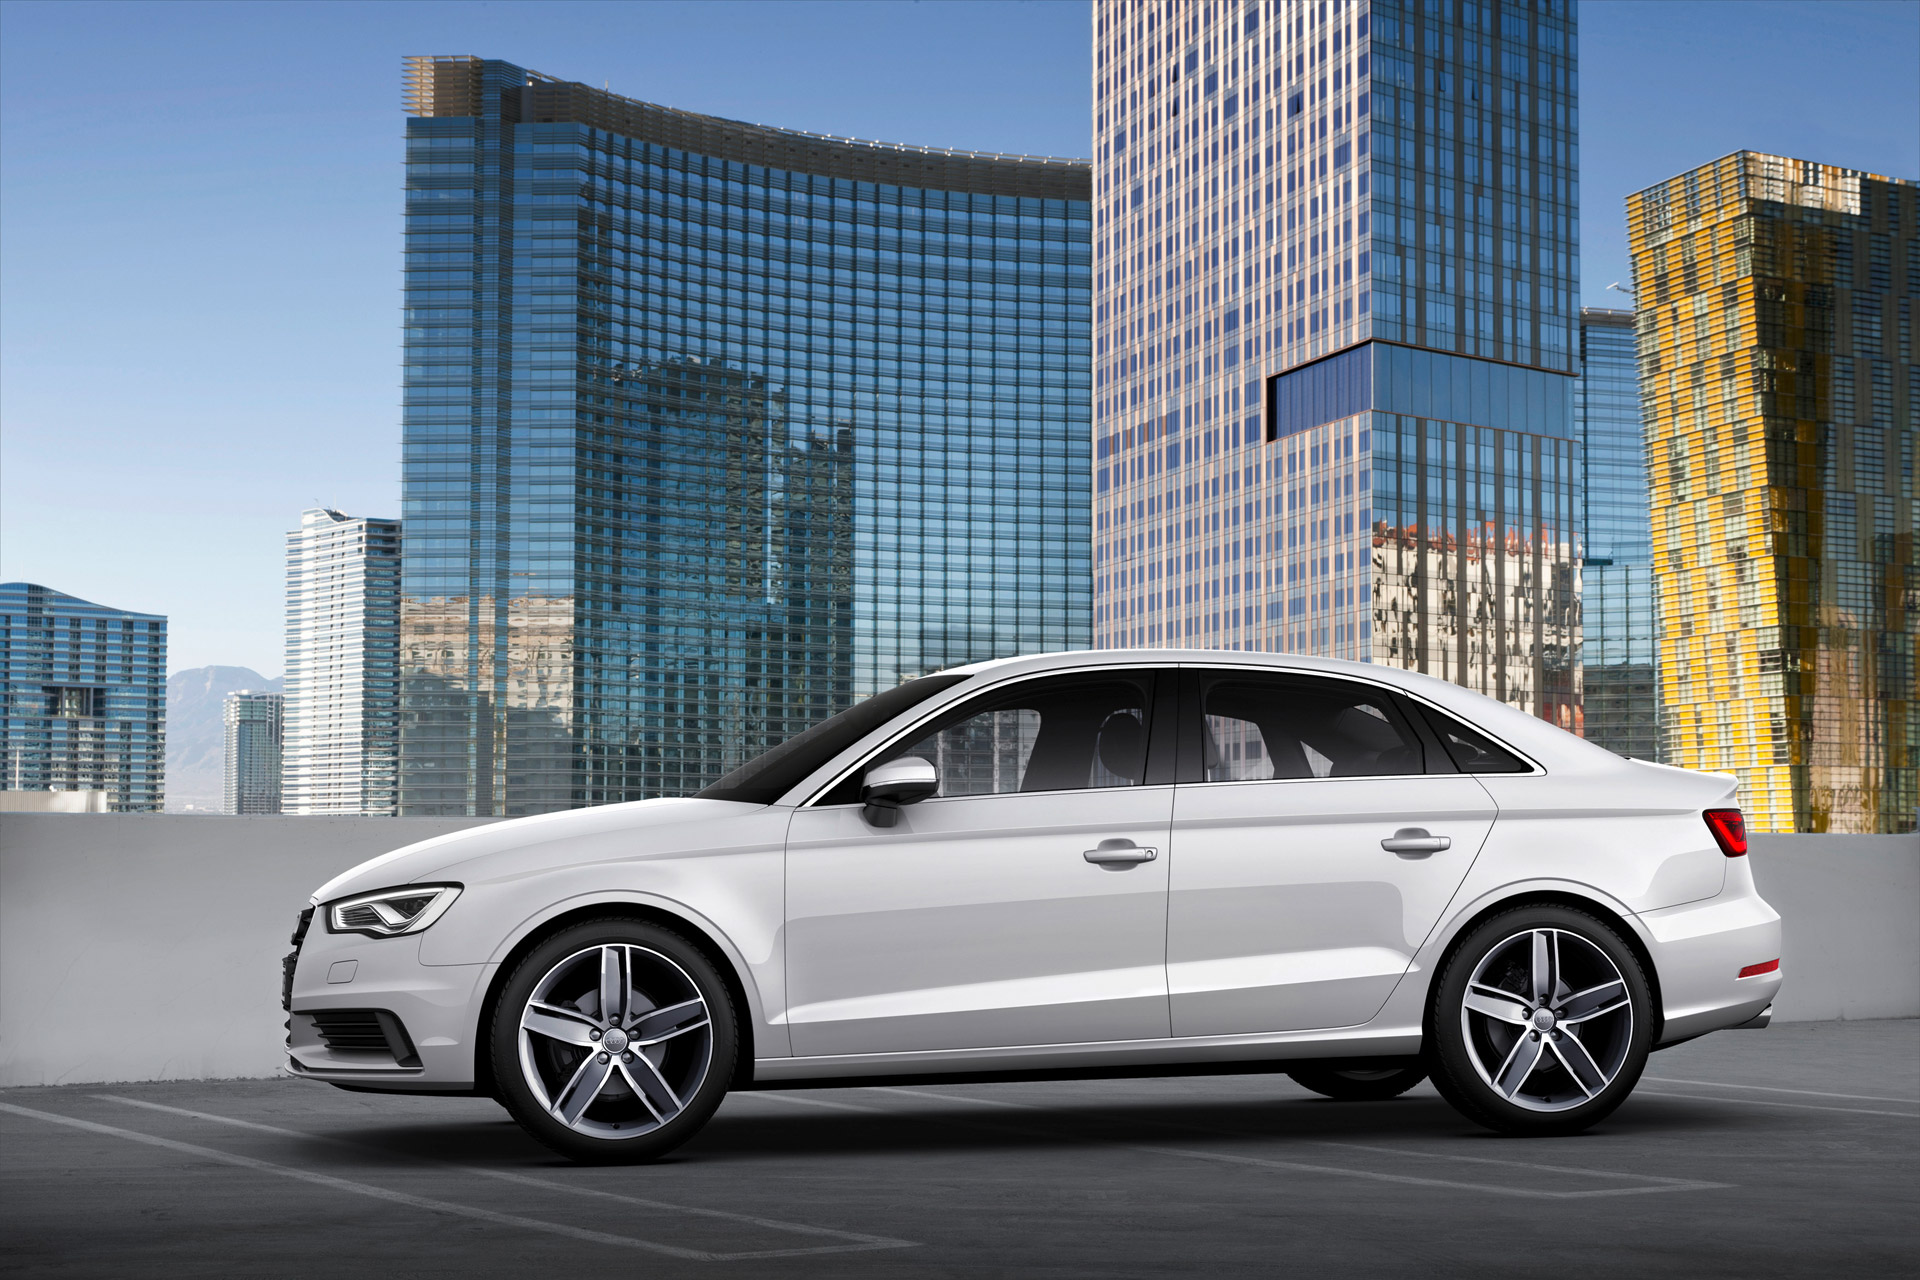 die neue audi a3 limousine audi r stet sich f r den markt der kompakten limousinen fanaticar. Black Bedroom Furniture Sets. Home Design Ideas